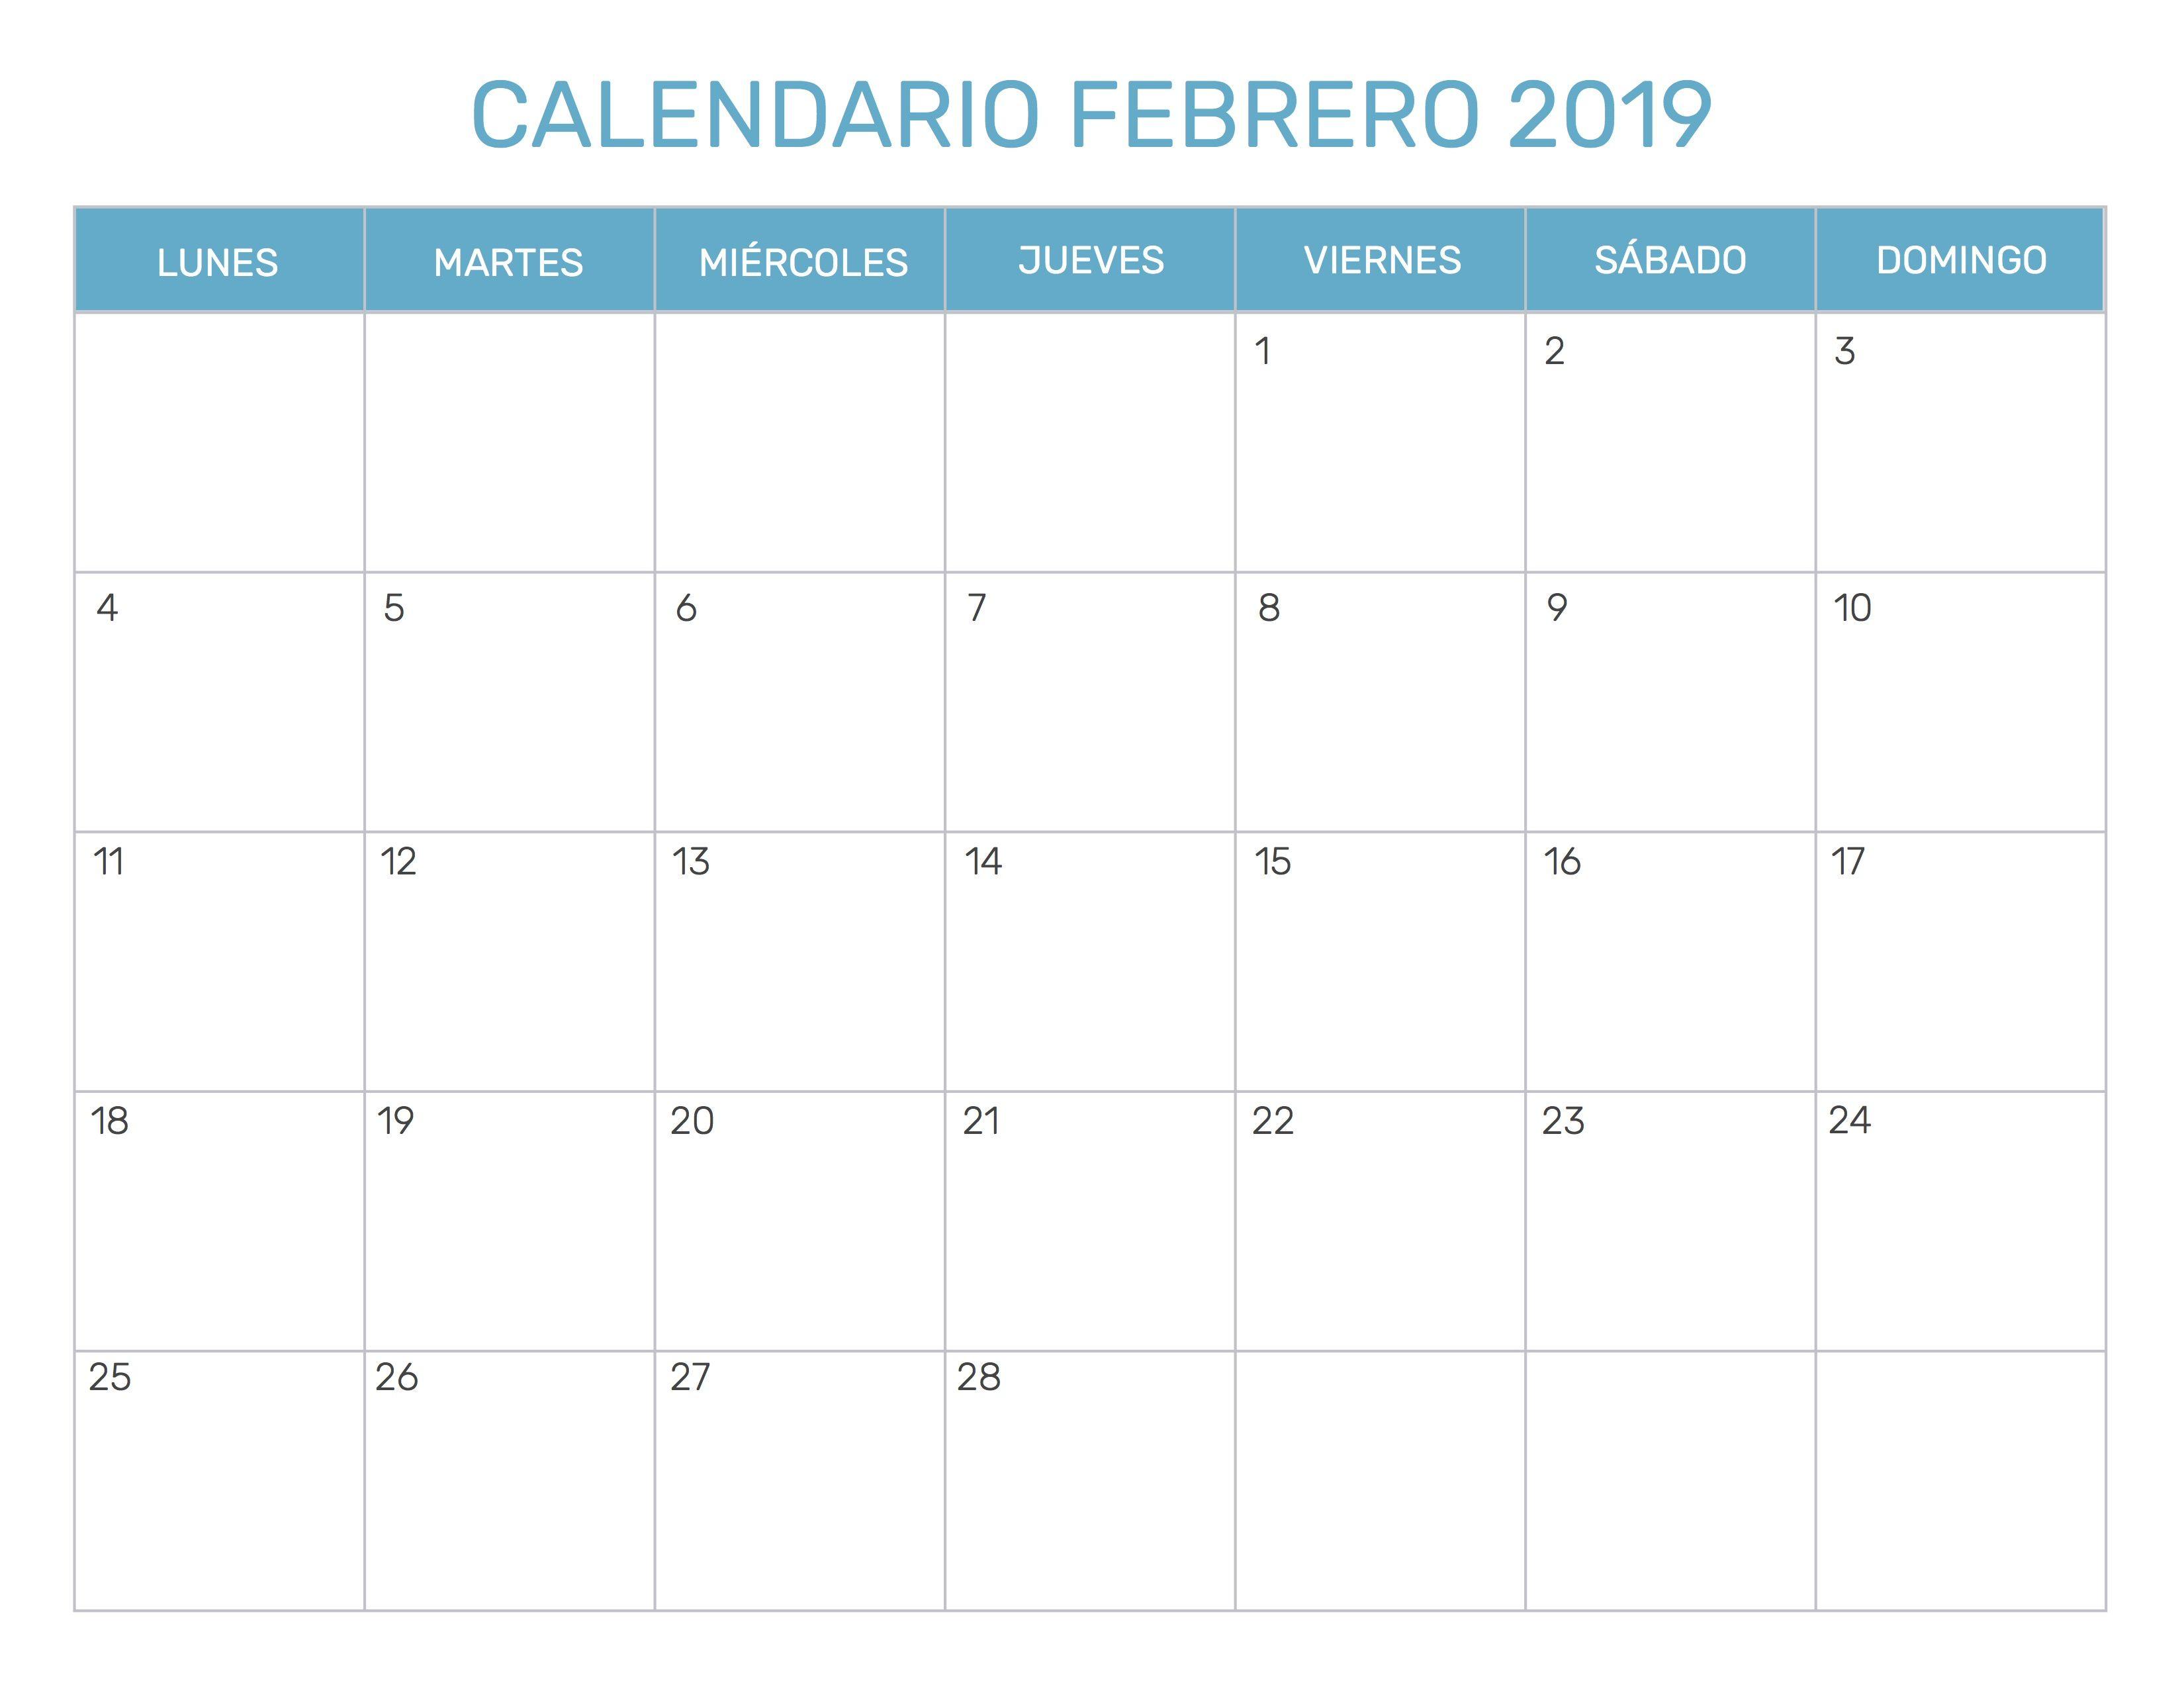 Calendario 2020 Excel Italiano.Calendario Febrero 2019 Excel 2019 Calendars Monthly